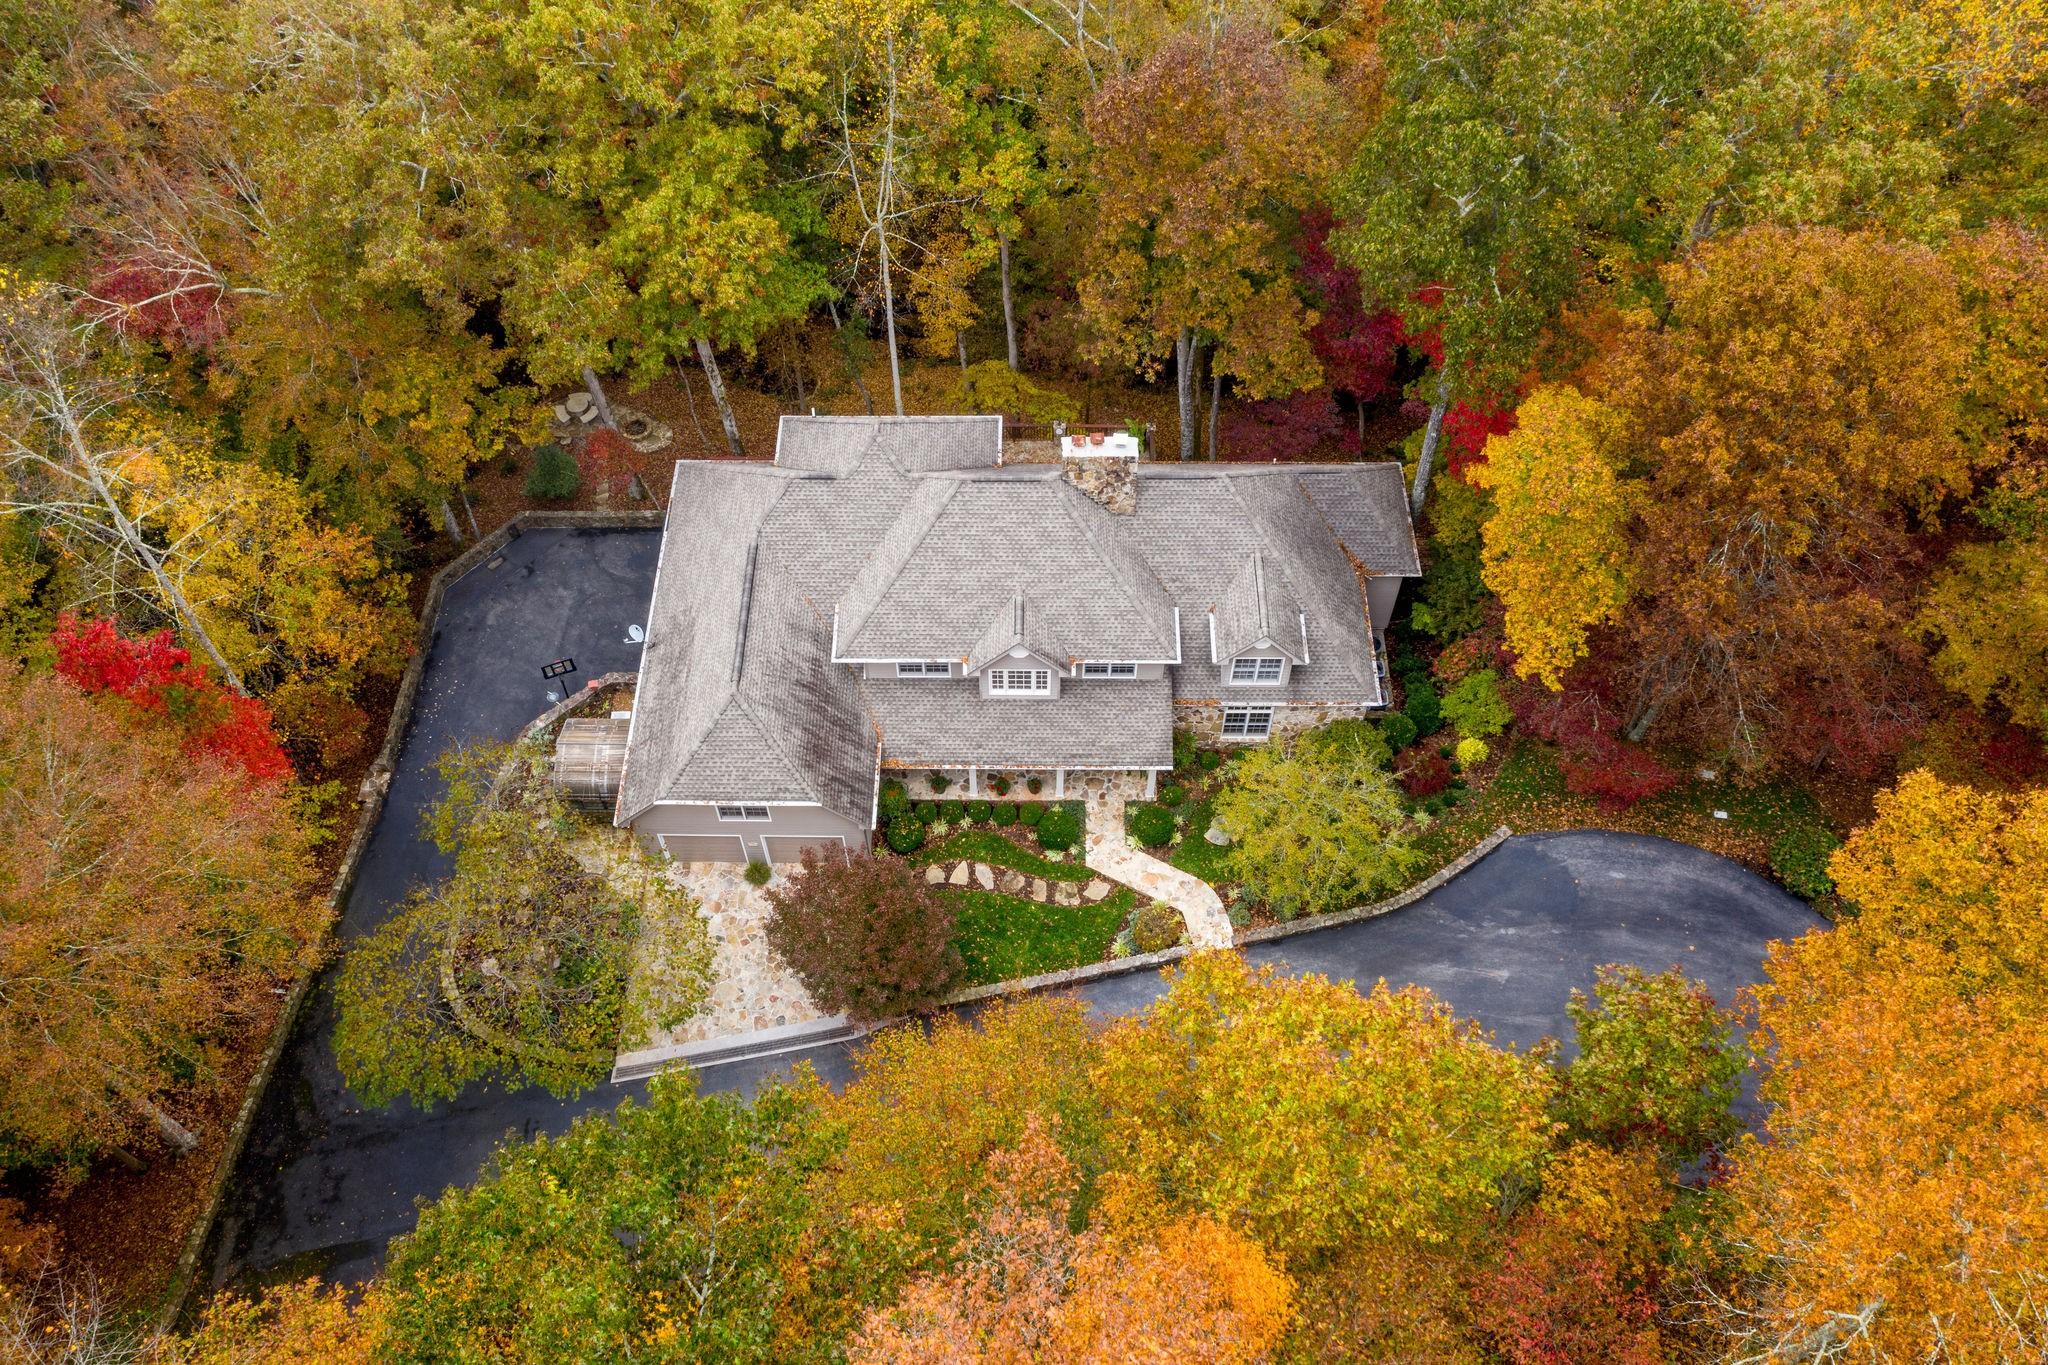 165 Timber Falls Ln, Tullahoma, TN 37388 - Tullahoma, TN real estate listing